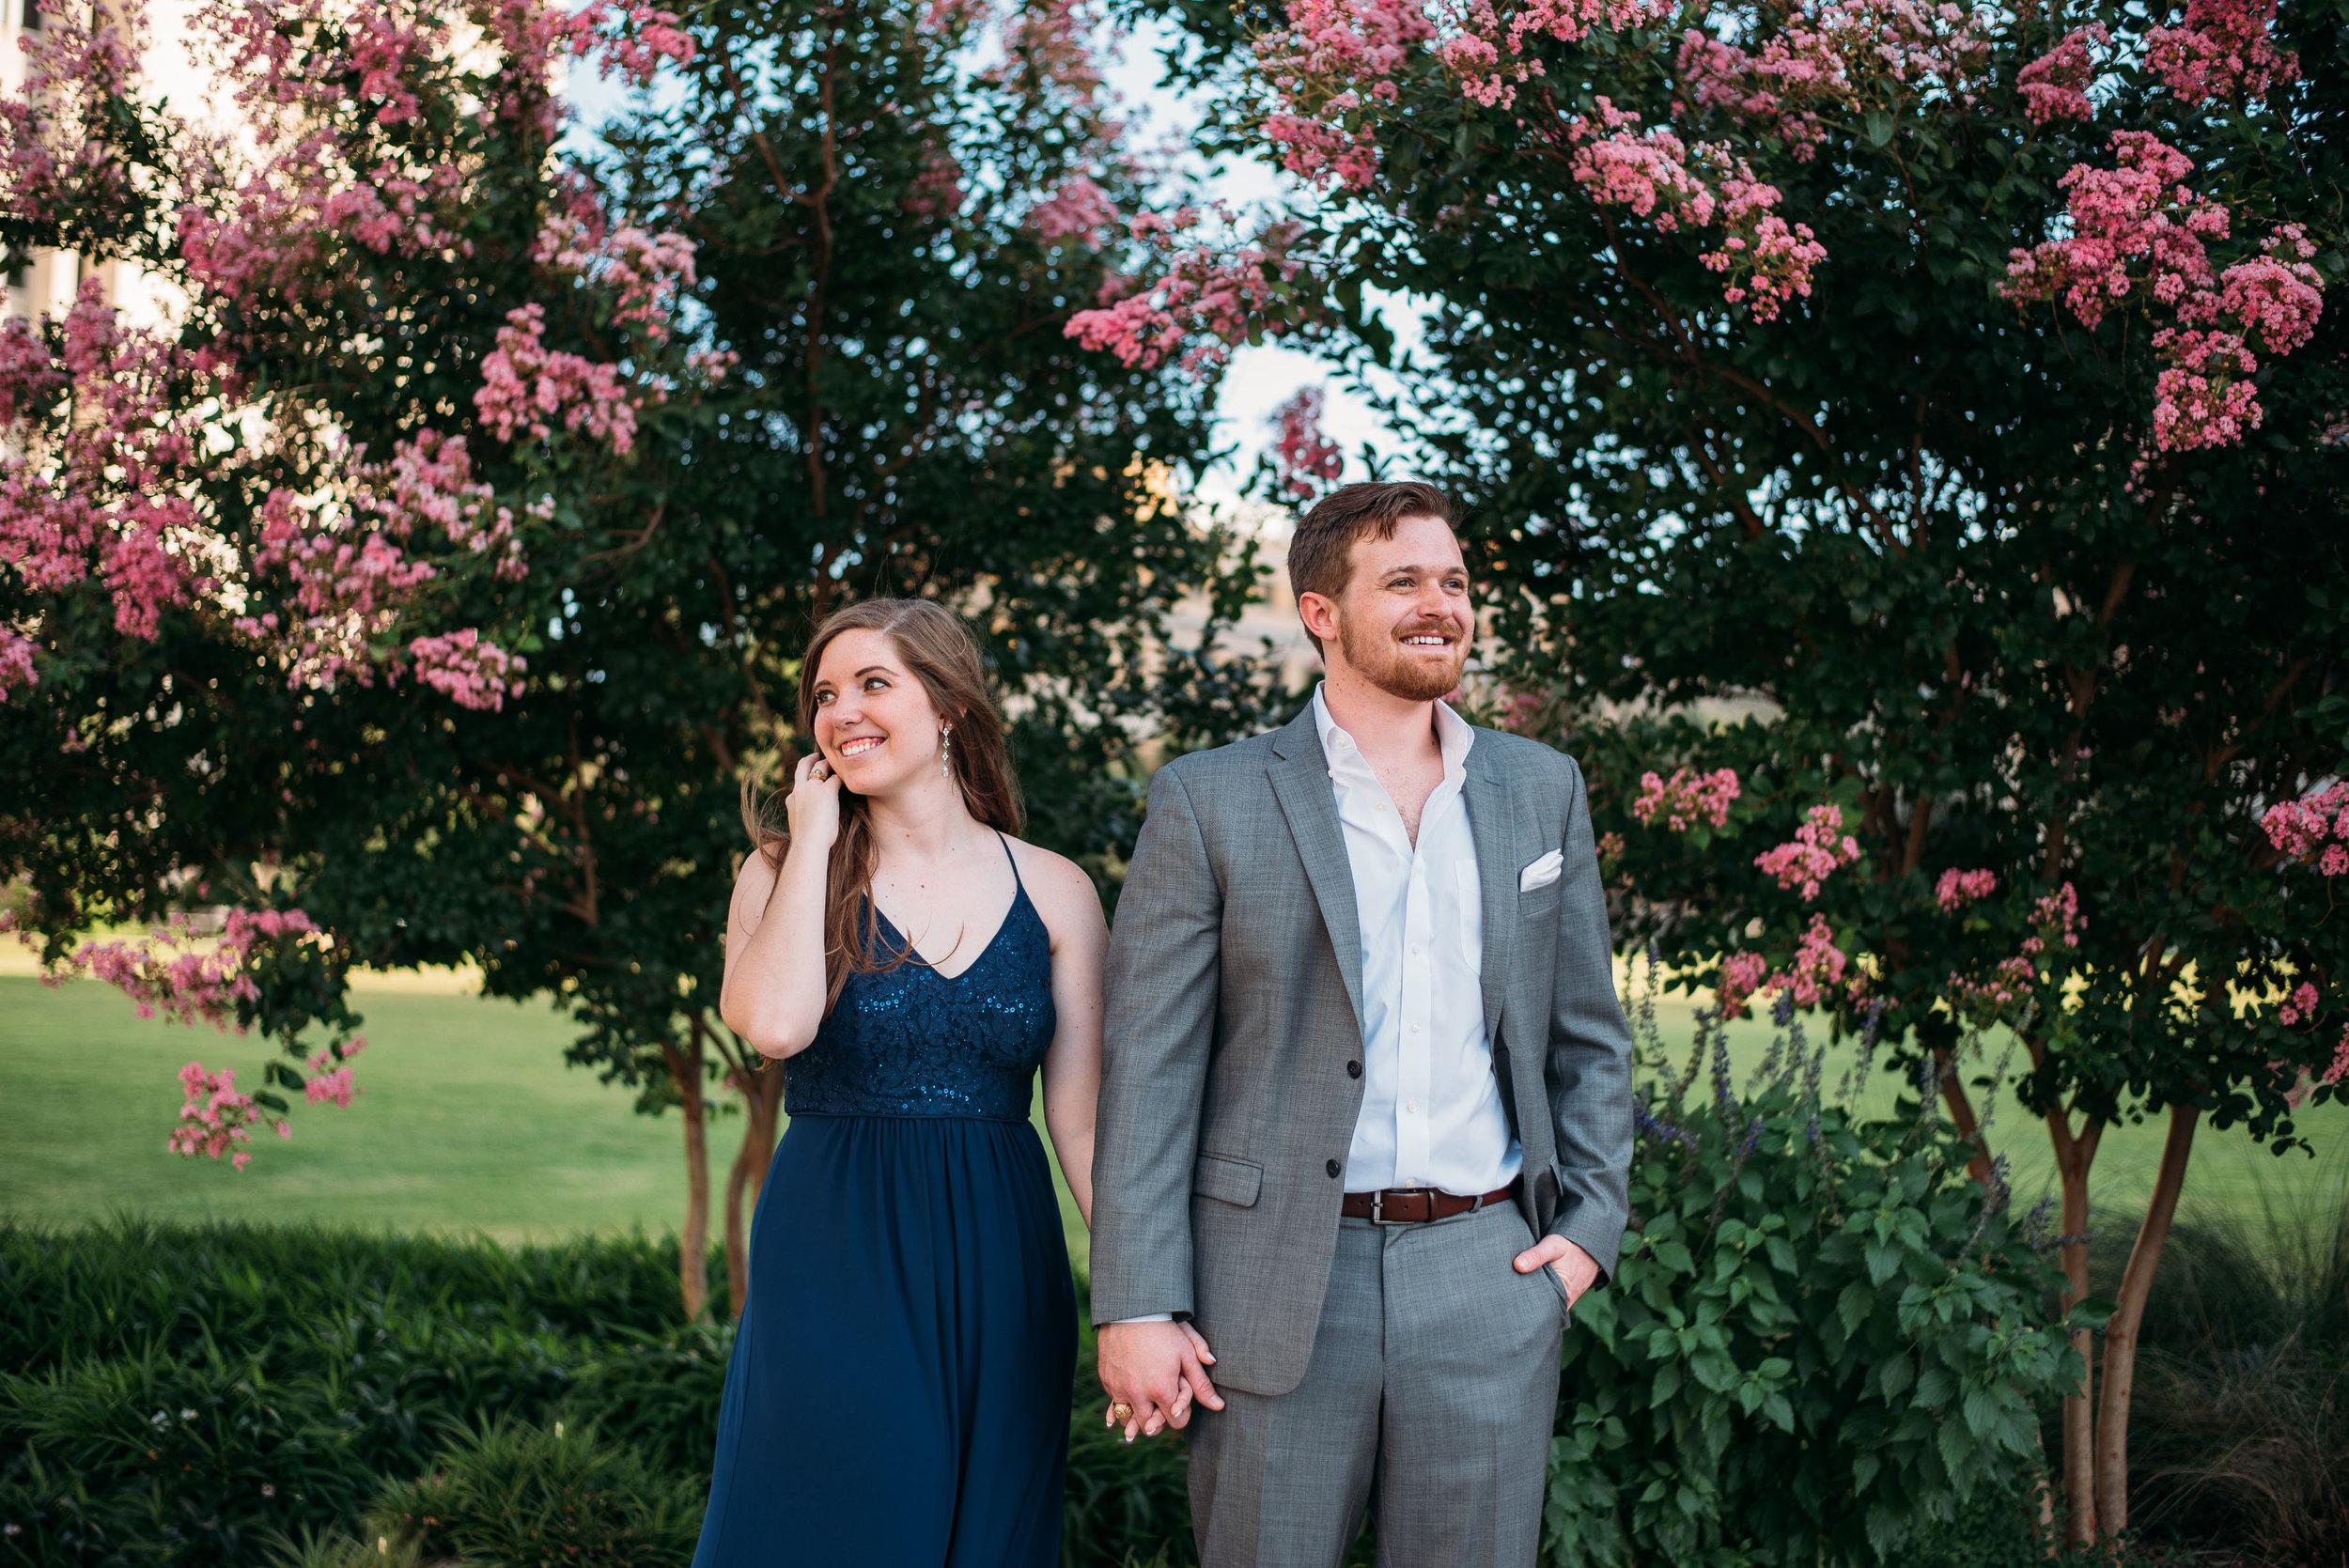 Texas-A&M-University-Engagement-College-Station-Wedding-Photographer-San-Angel-Photo-Mark-Johanna-Century-Tree-17.jpg